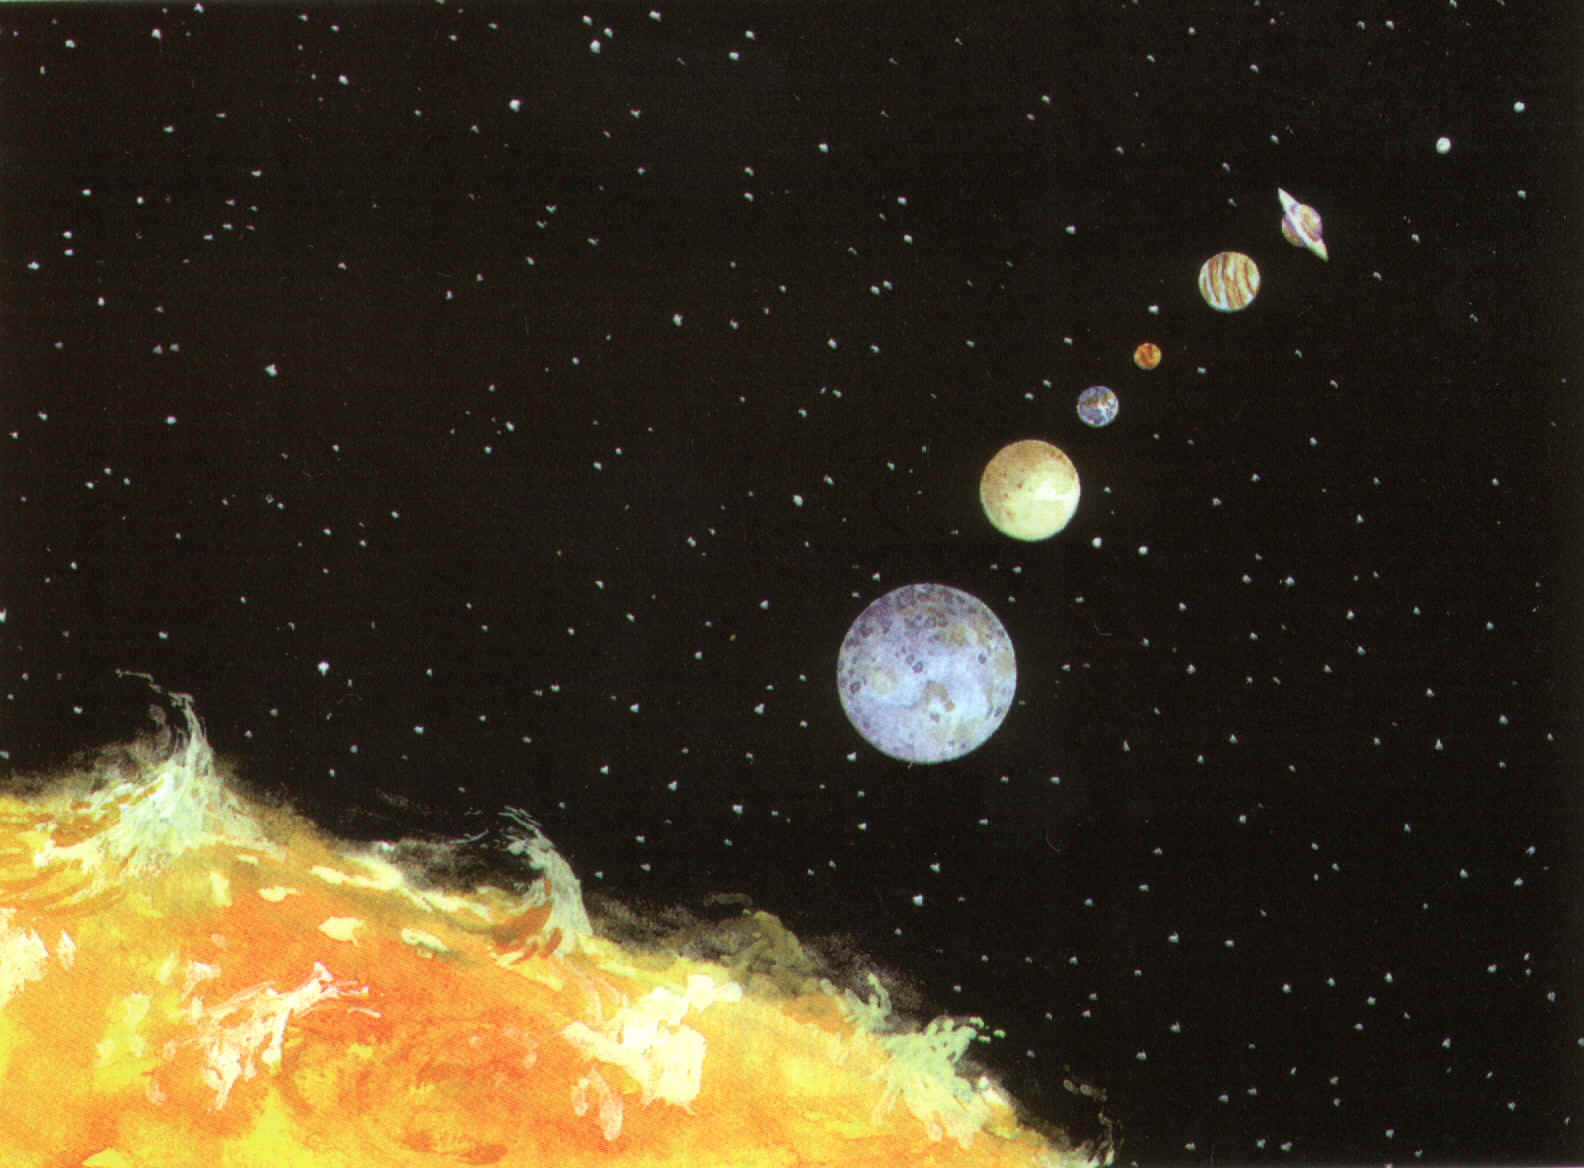 O Infinito e o Universo